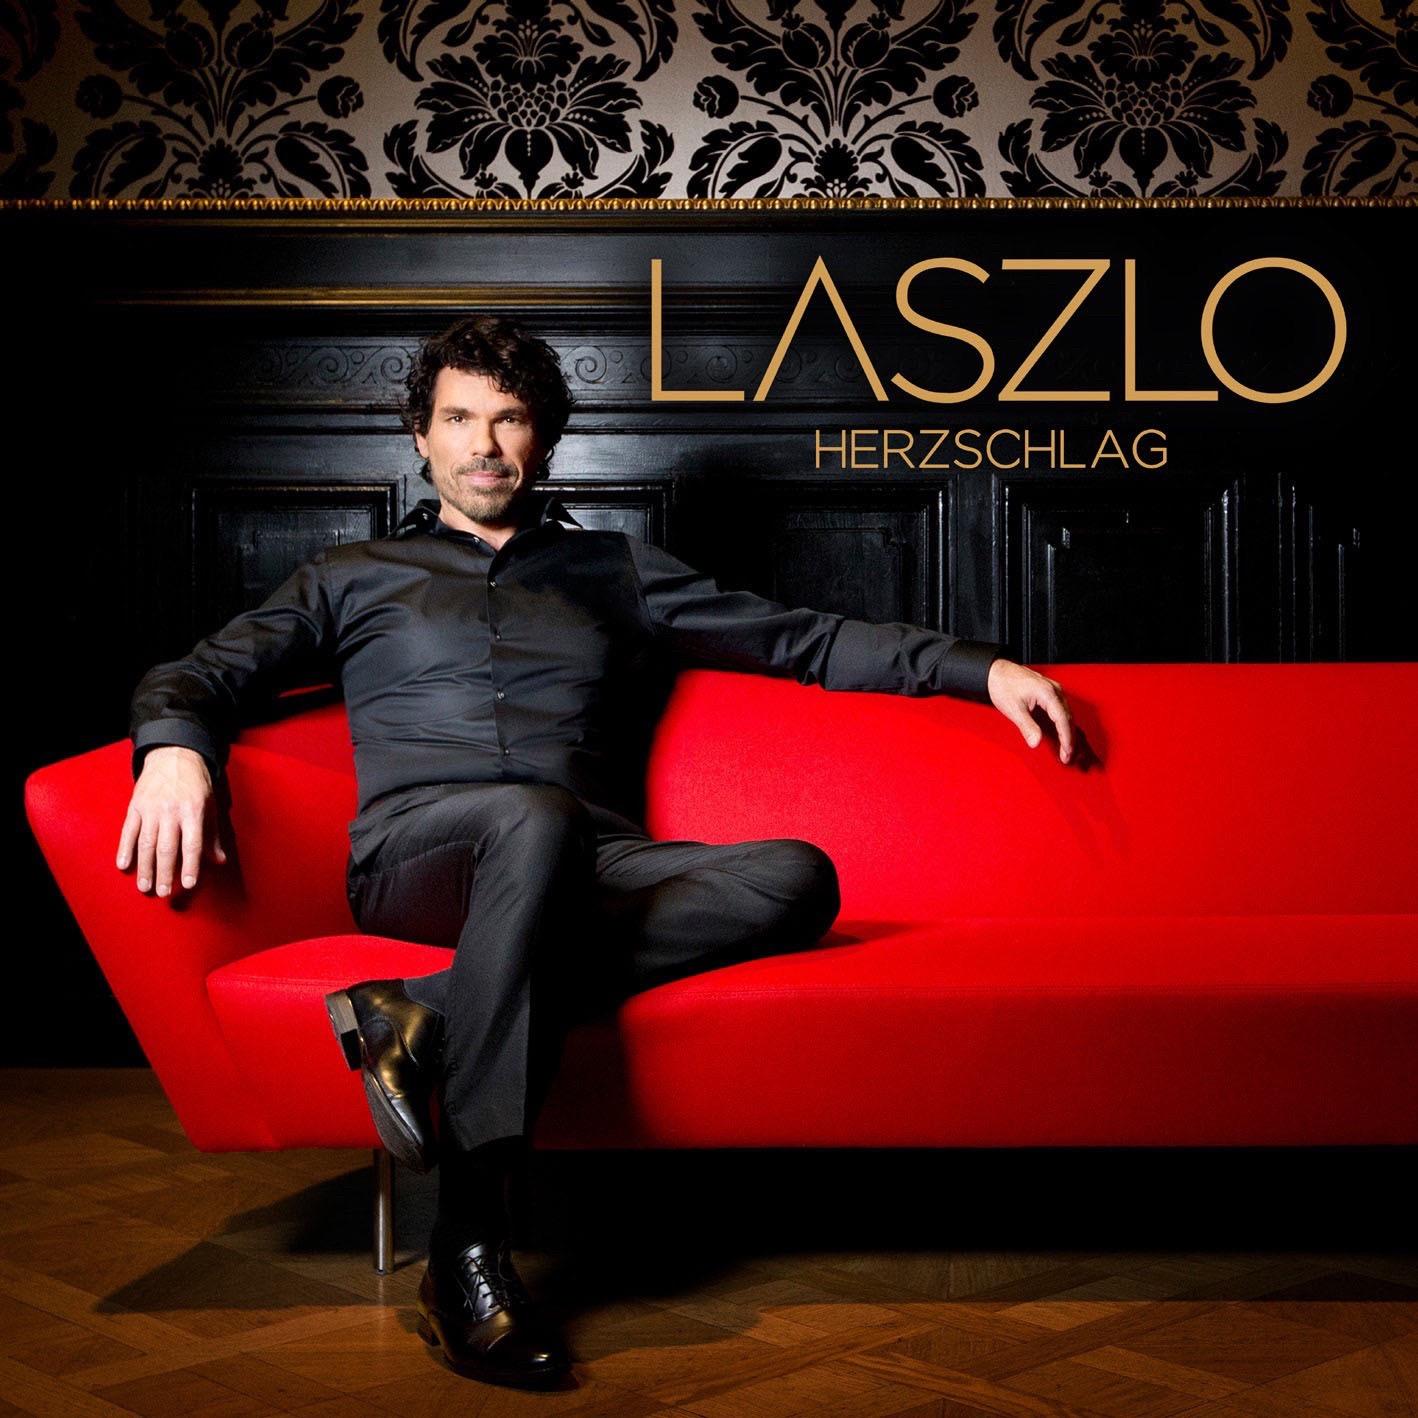 LASZLO HERZSCHLAG COVER TENOR KLASSIK POP NEU LEIDENSCHAFT LEBEN LIEBEN HOFFNUNG SOUNDTRACK FILMMUSIK CHARTS